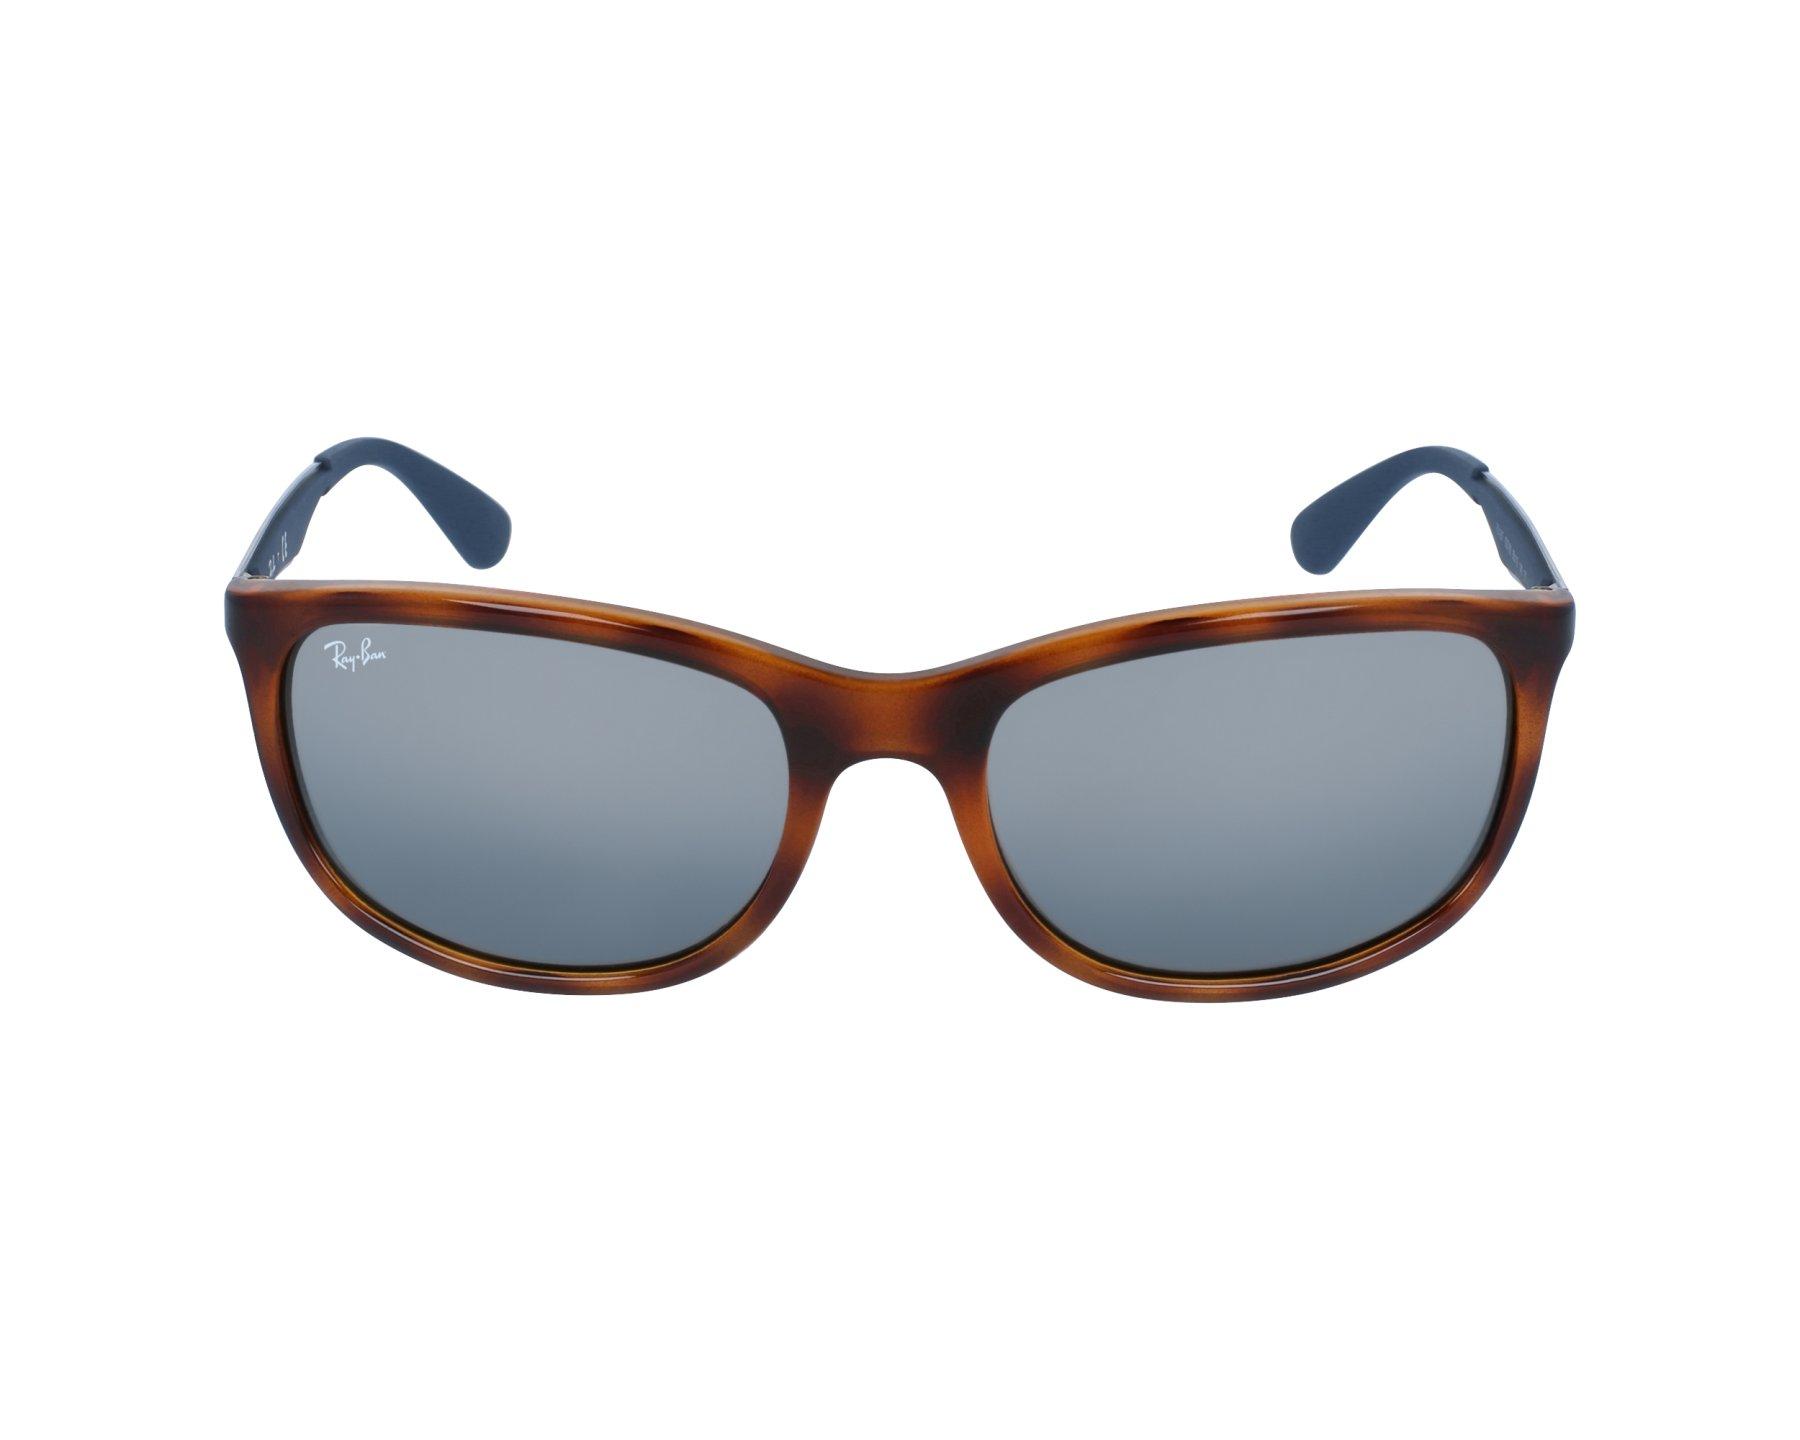 8ef85cdd7d3 Sunglasses Ray-Ban RB-4267 6257 88 59-19 Havana Grey profile